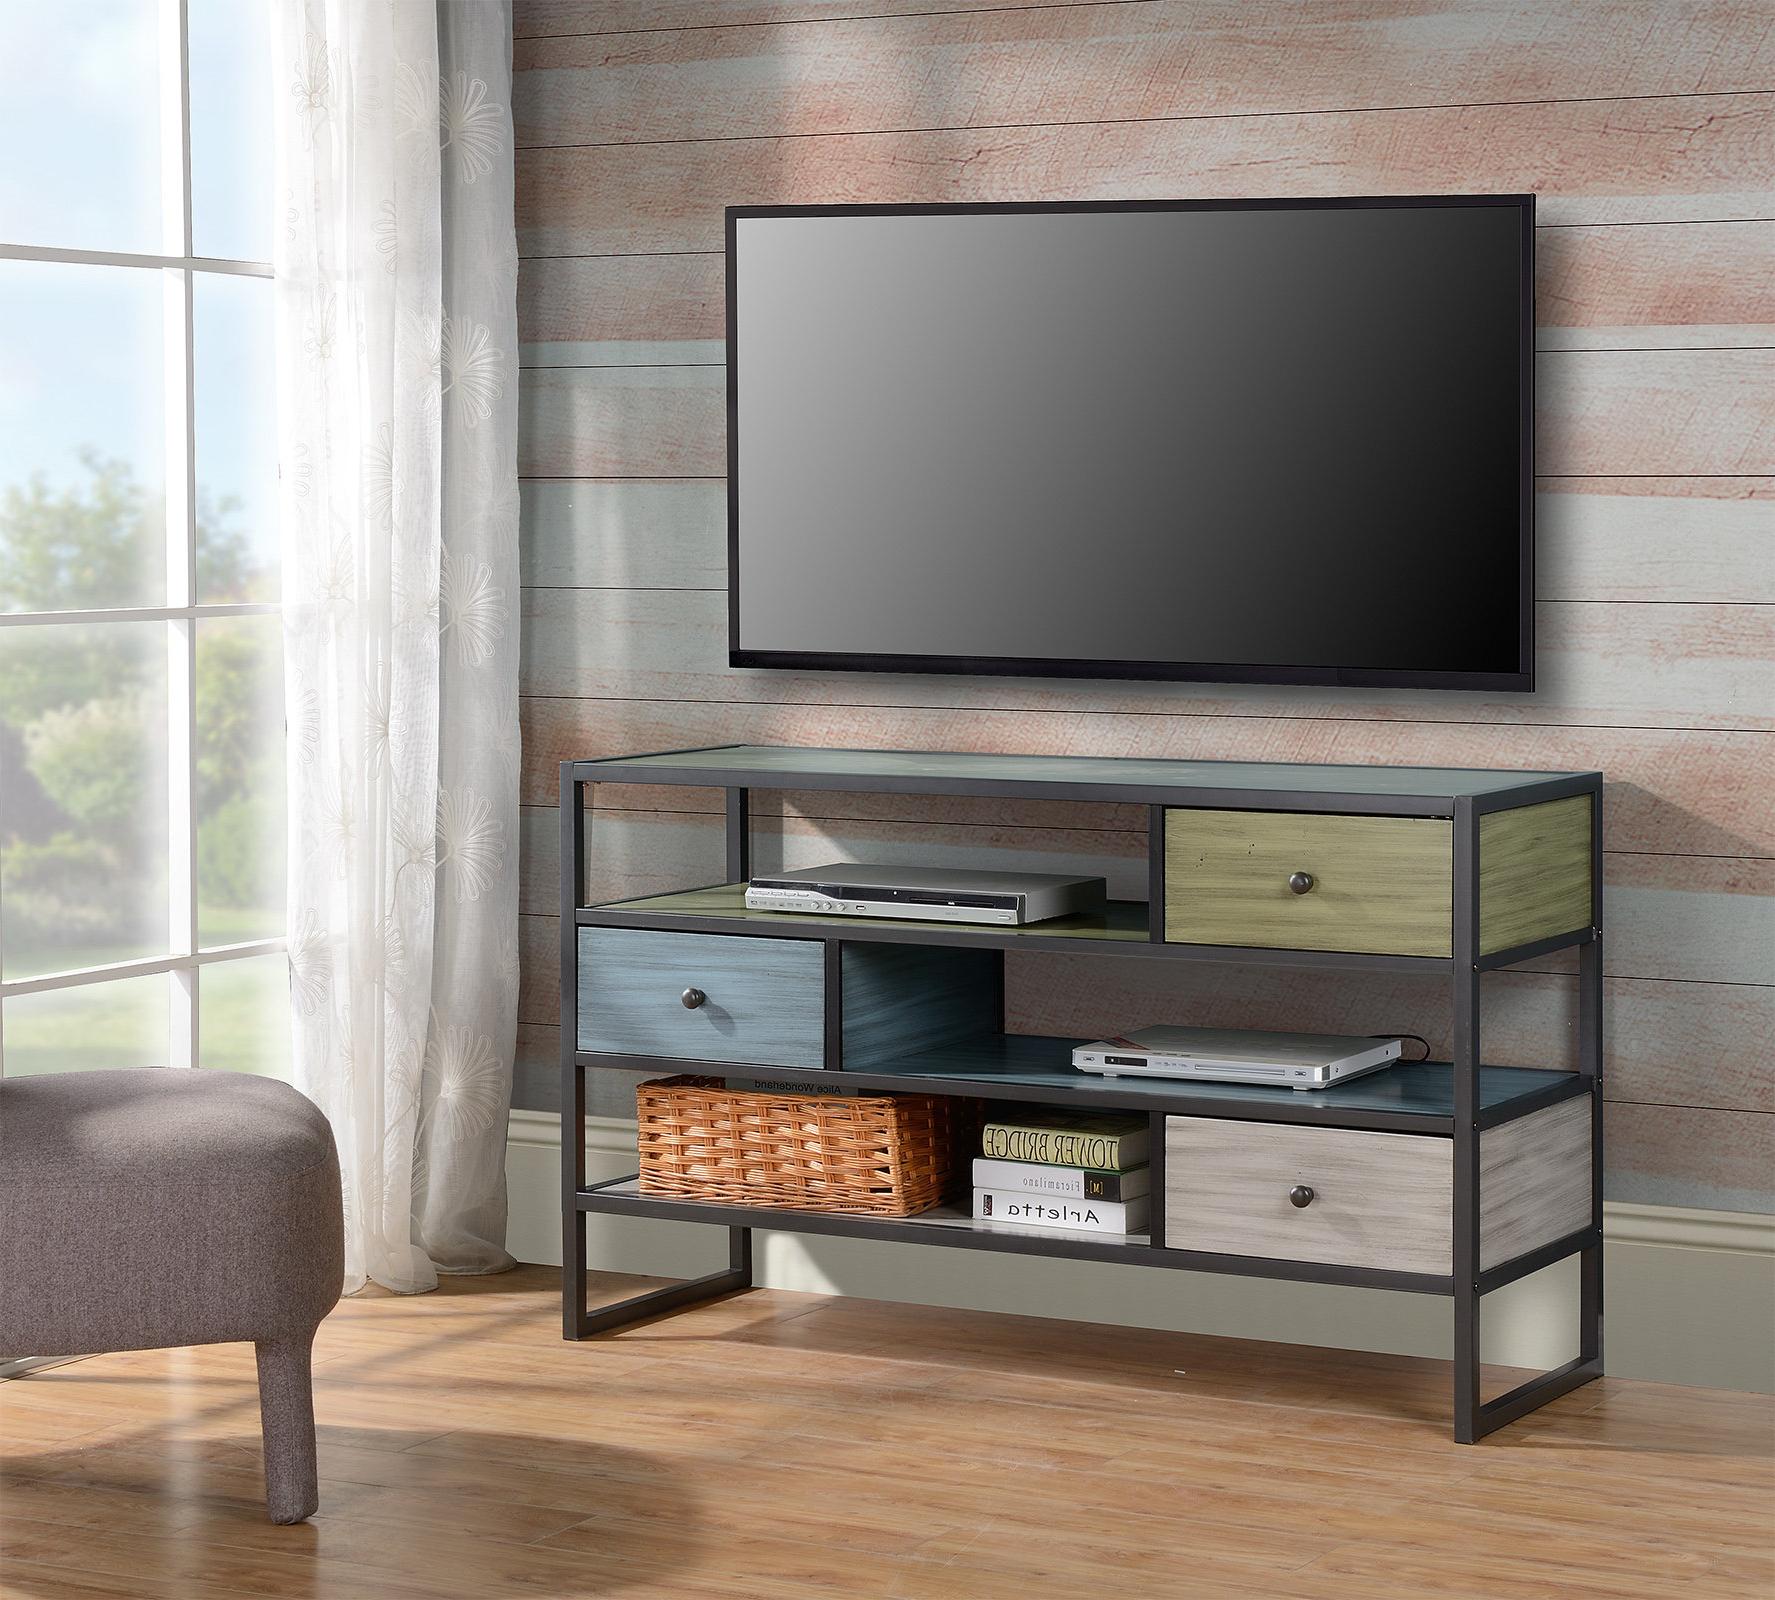 70 Inch Tv Stands | Joss & Main Regarding Bale Rustic Grey 82 Inch Tv Stands (View 12 of 20)